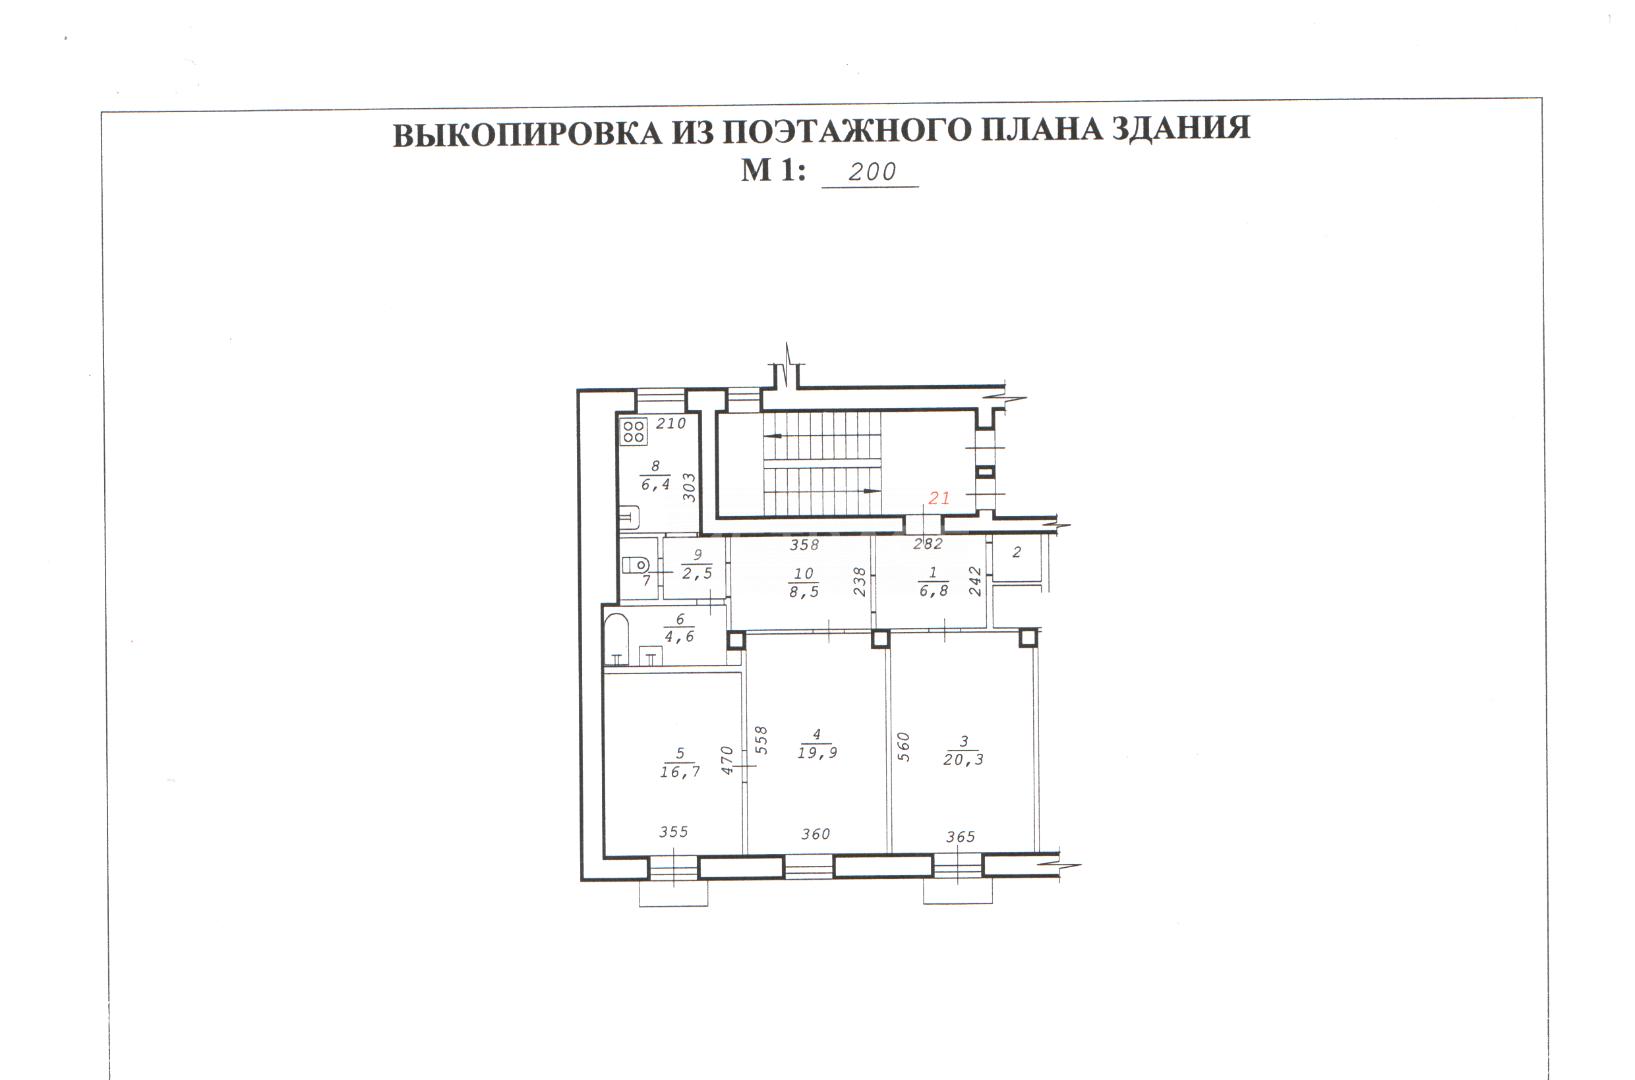 Новосибирск, Народная, 53, 3-комнатная квартира